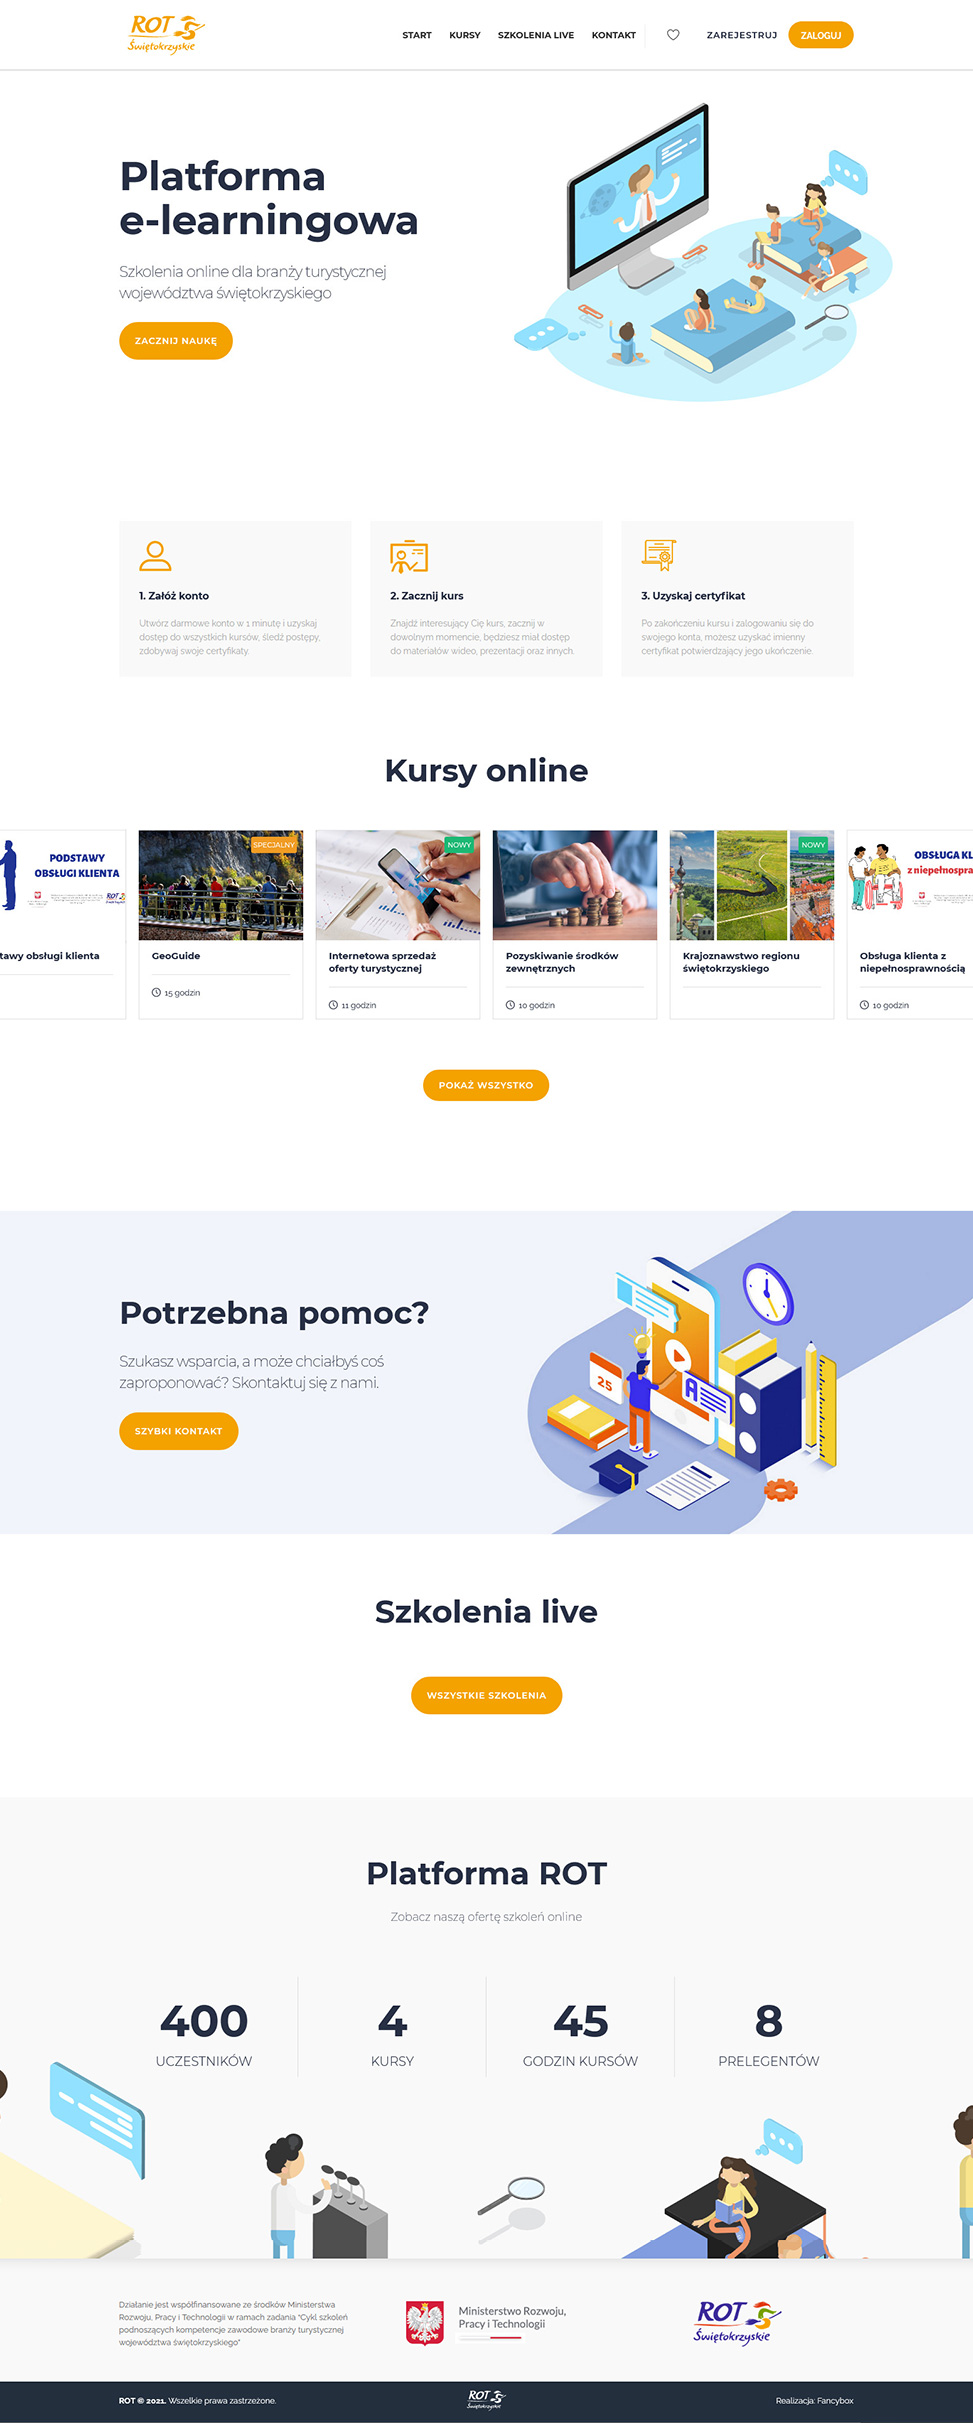 Platforma e-learningowa ROT